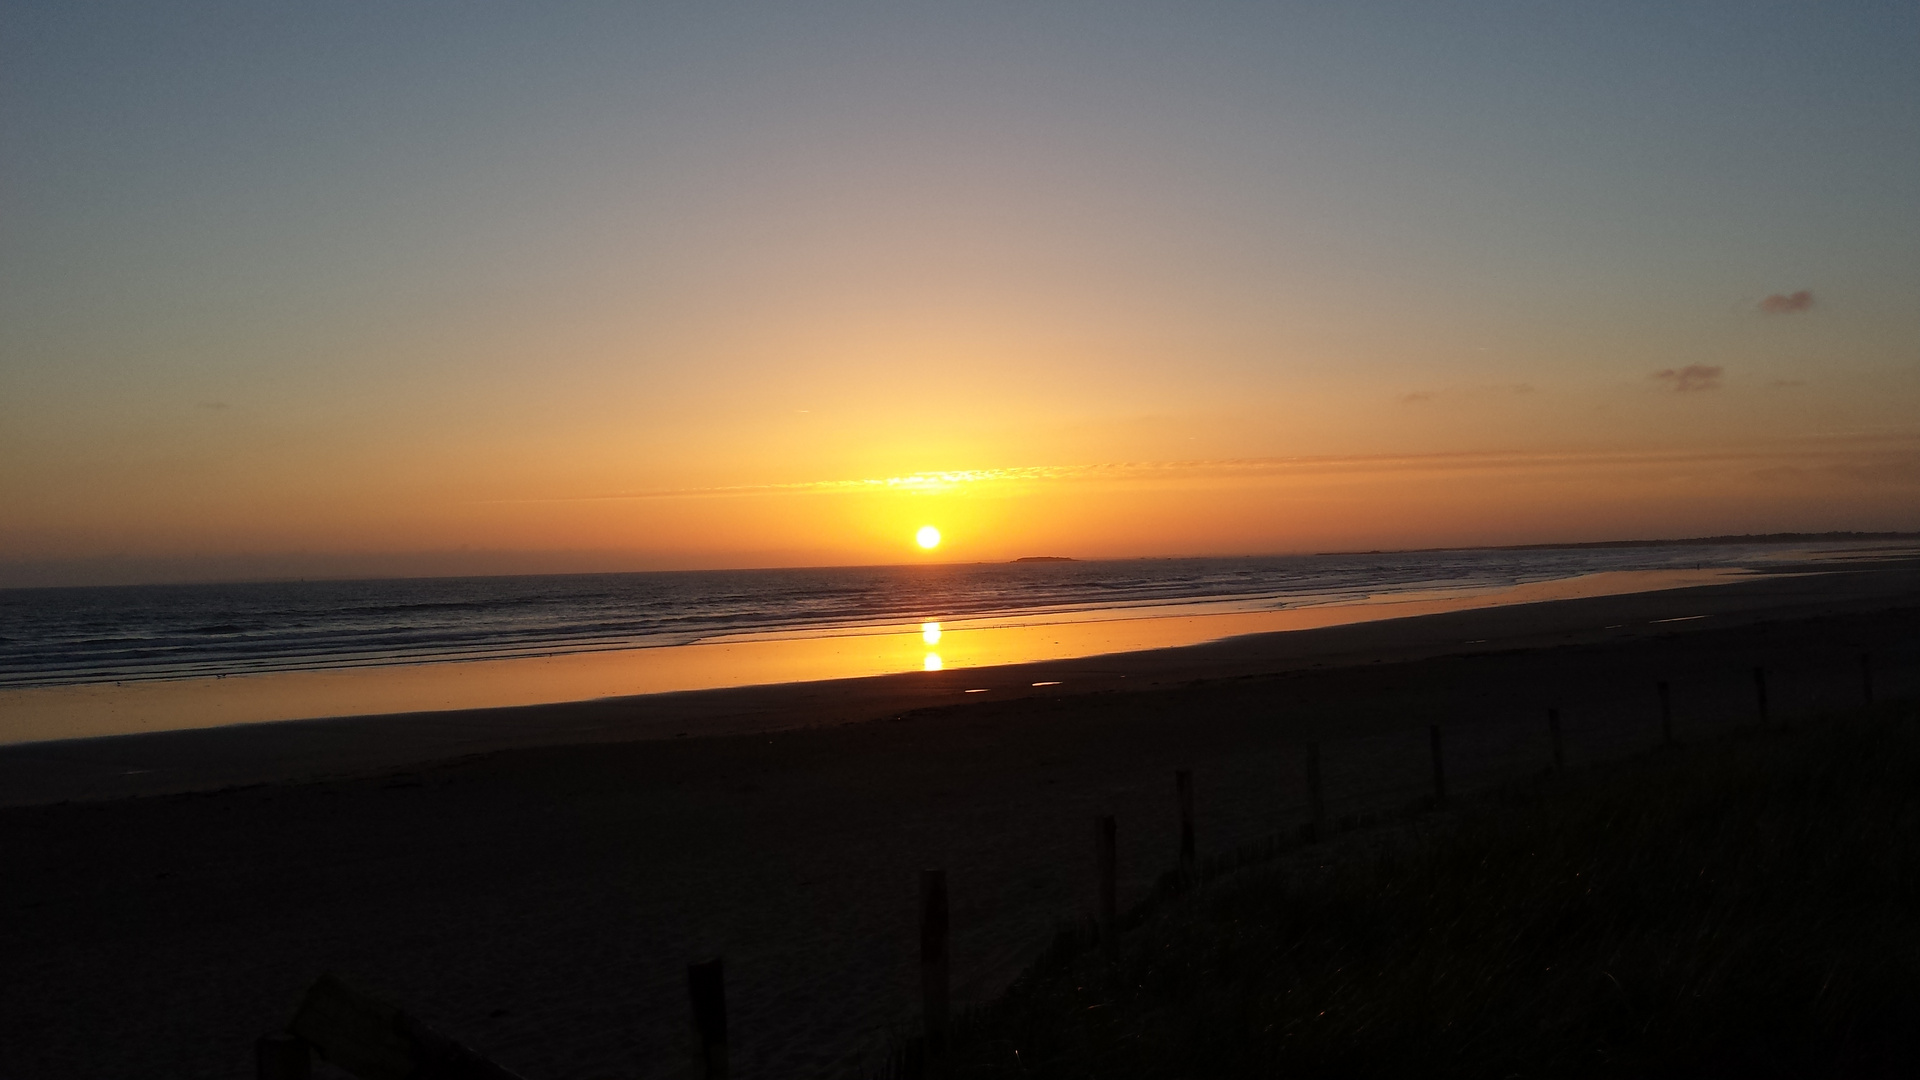 Sonnenuntergang am Atlantik in Frankreich